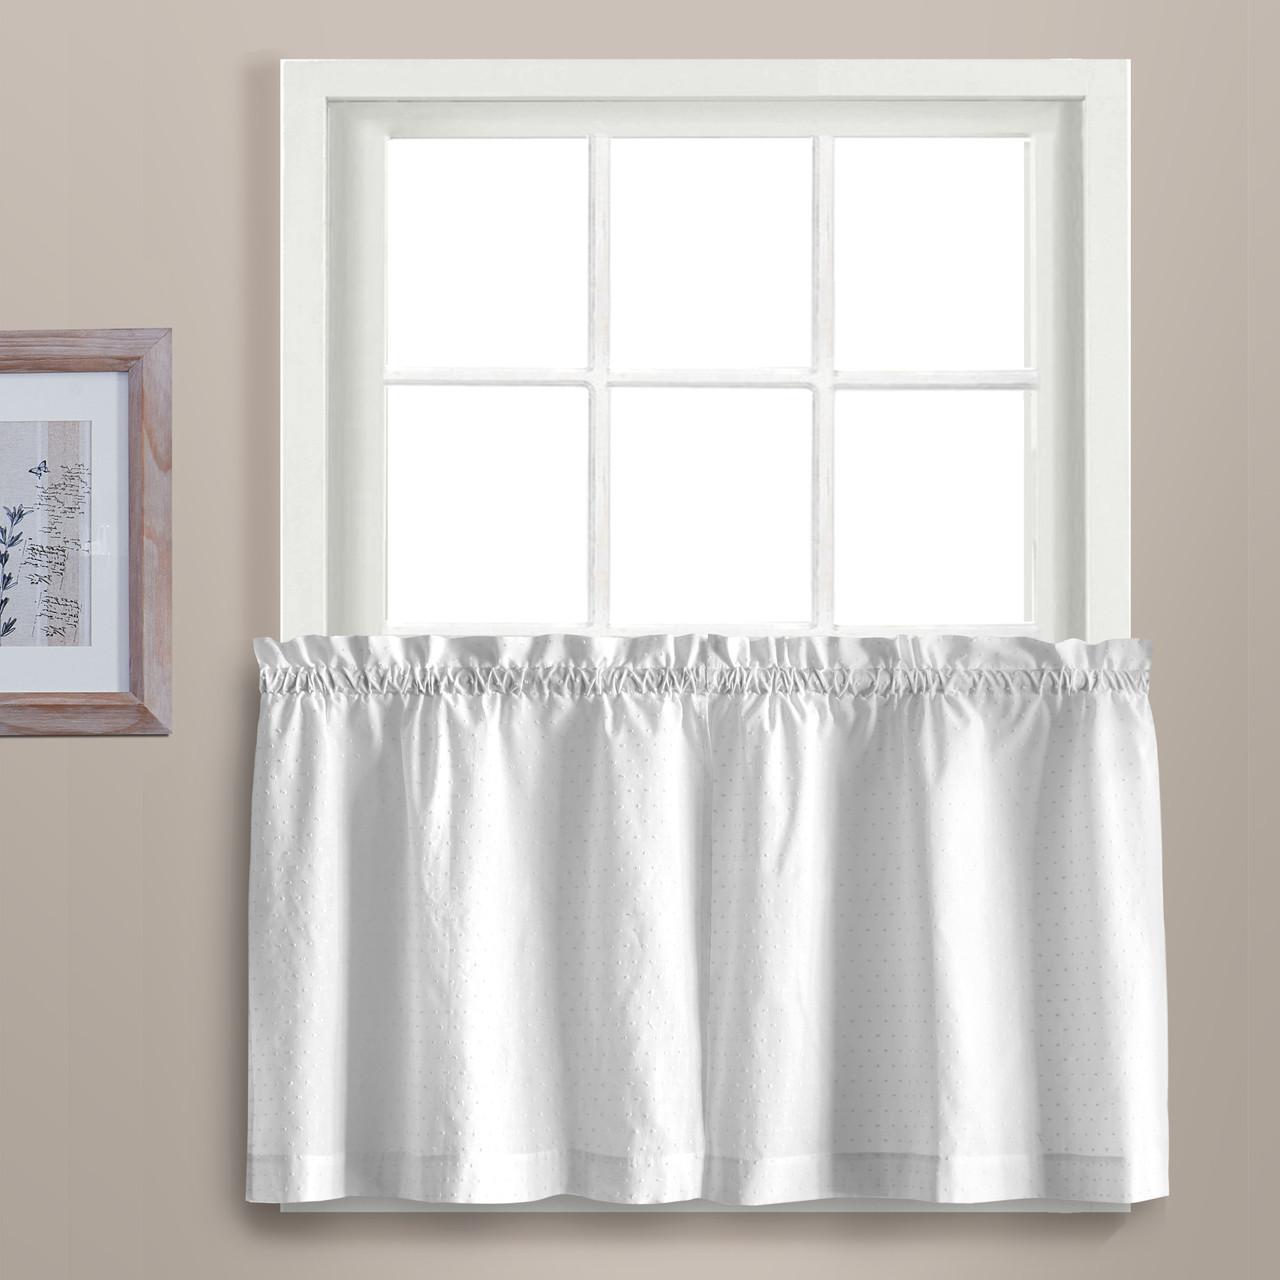 "Dorothy 24"" Kitchen Curtain Tier"